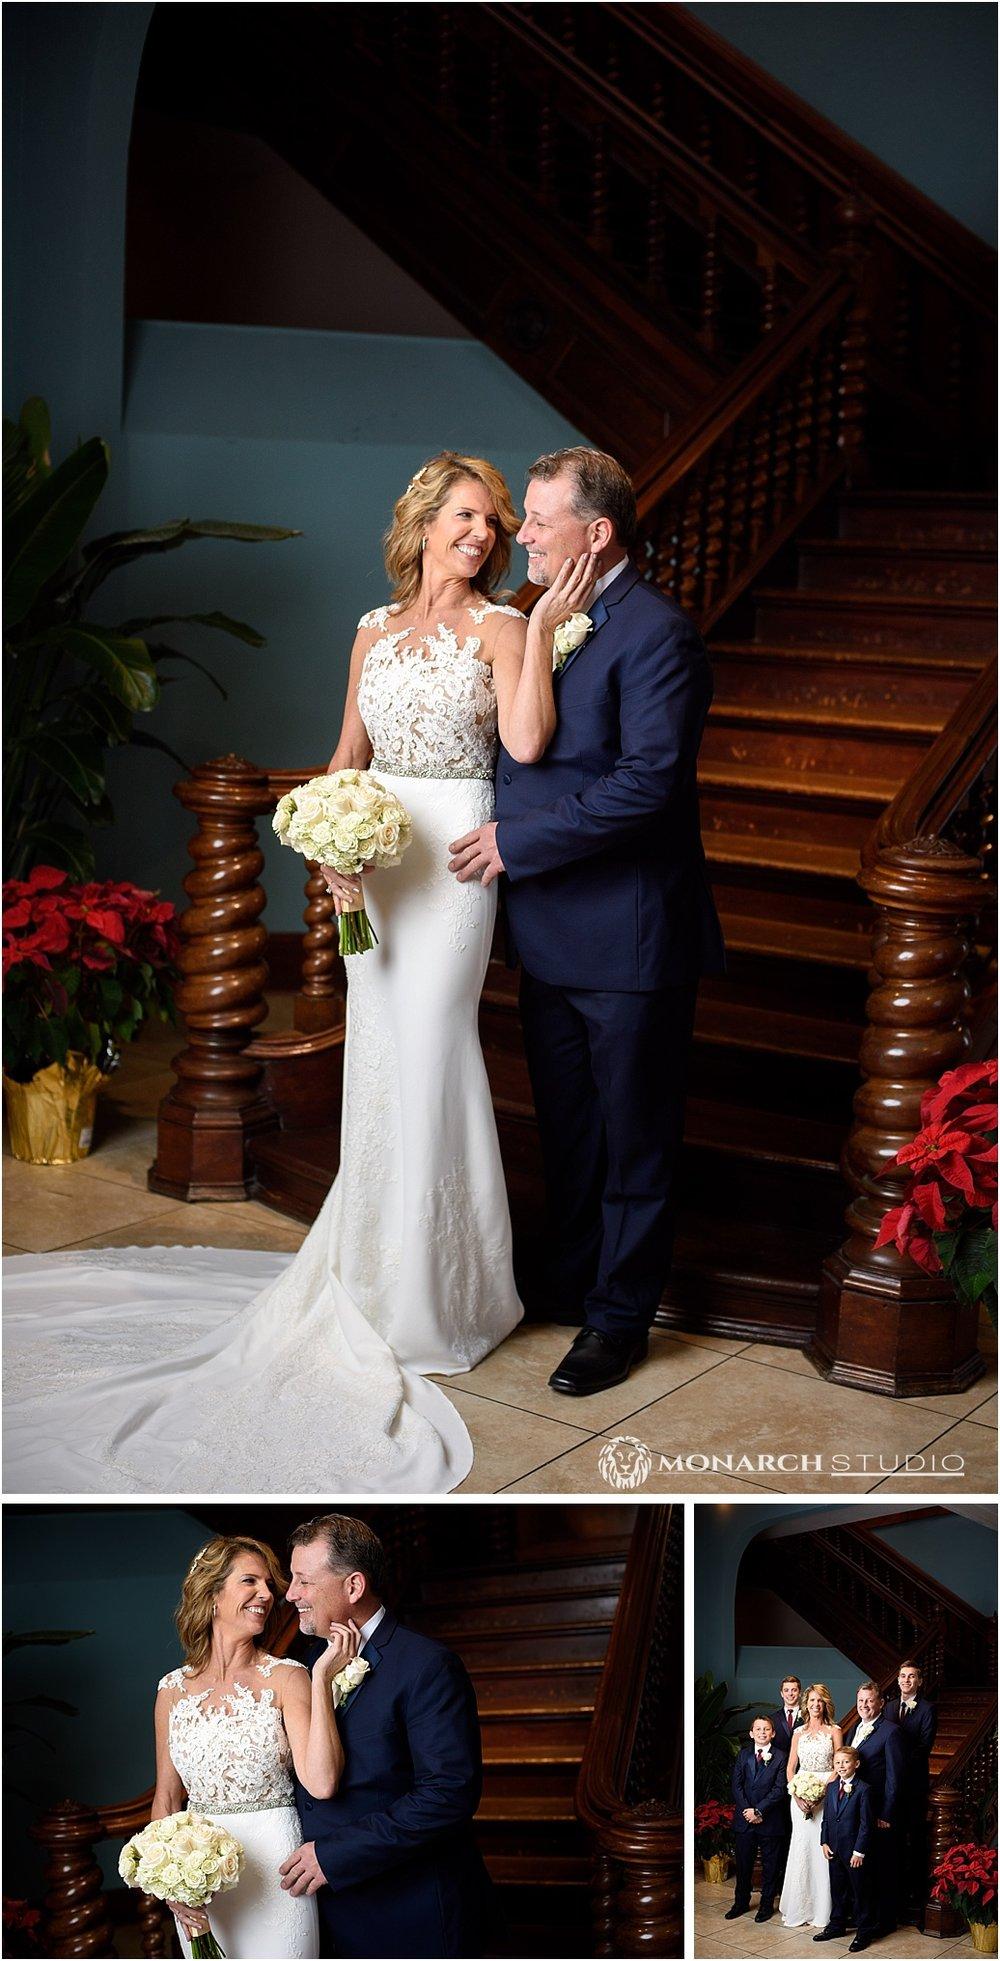 nights-of-lights-st-augustine-whiteroom-wedding-006.jpg